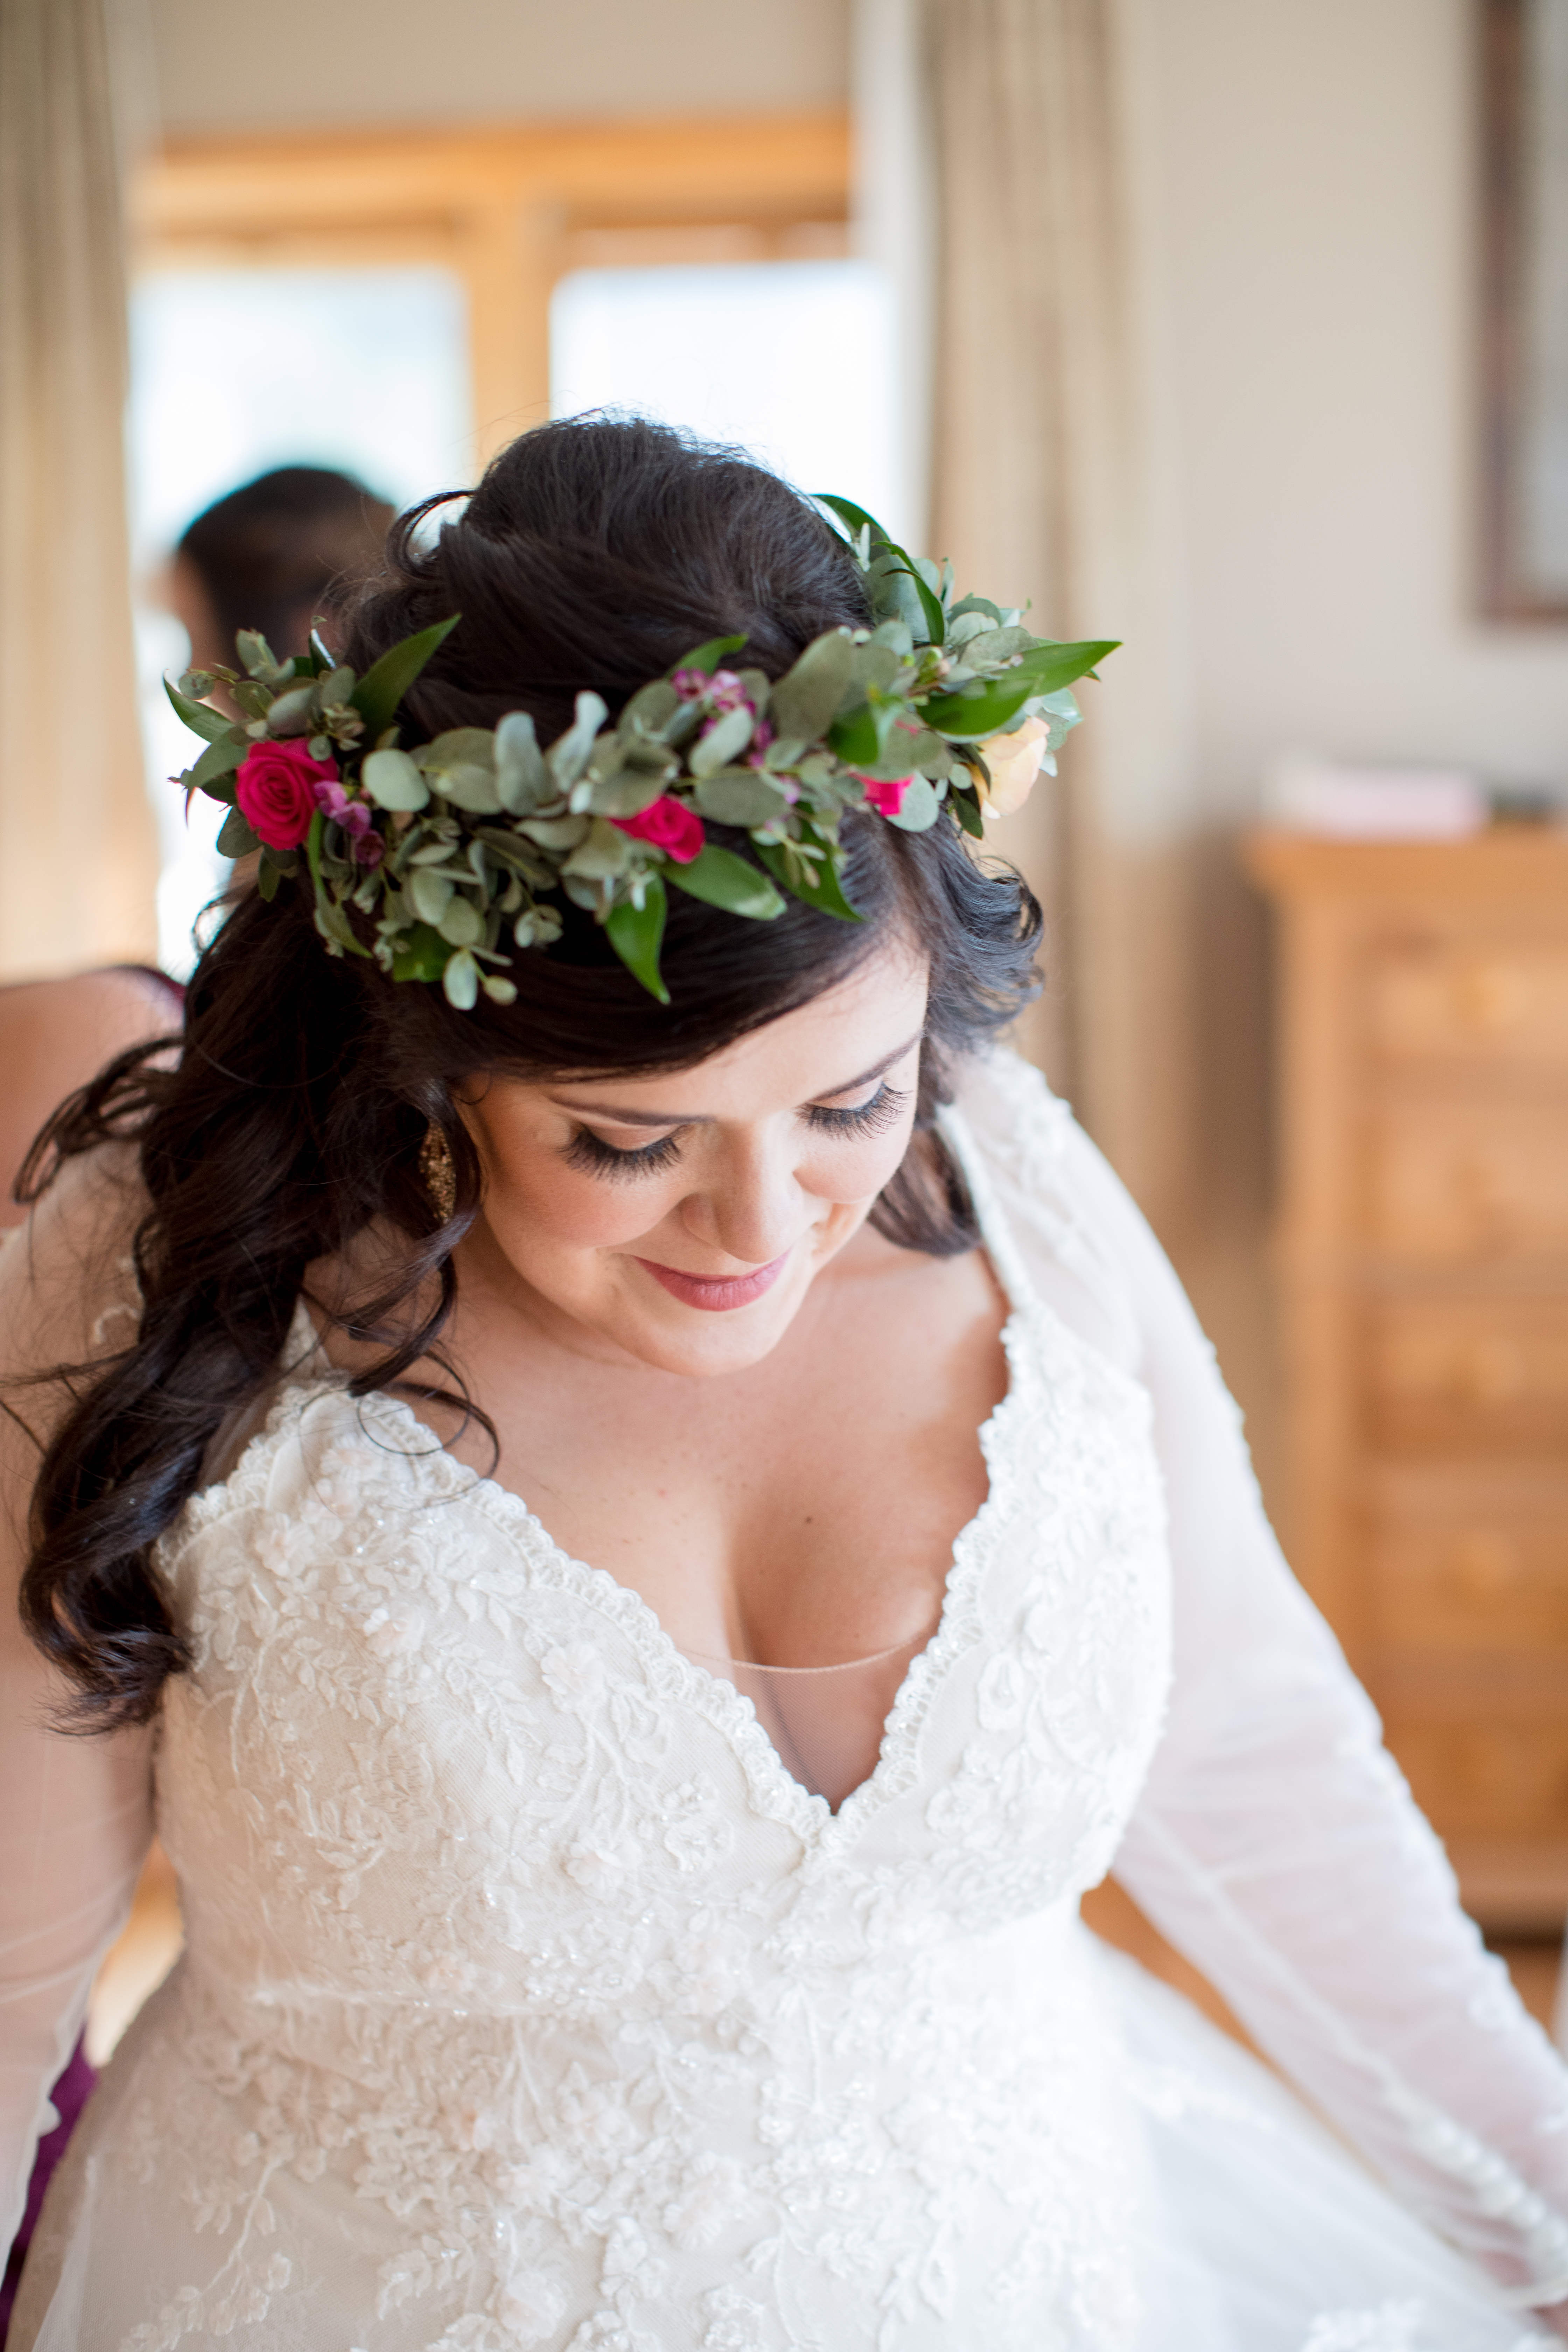 Private-Home-Rental-Wedding-VRBO-Fall-Breckenridge-Colorado-Bride-Flower-Crown